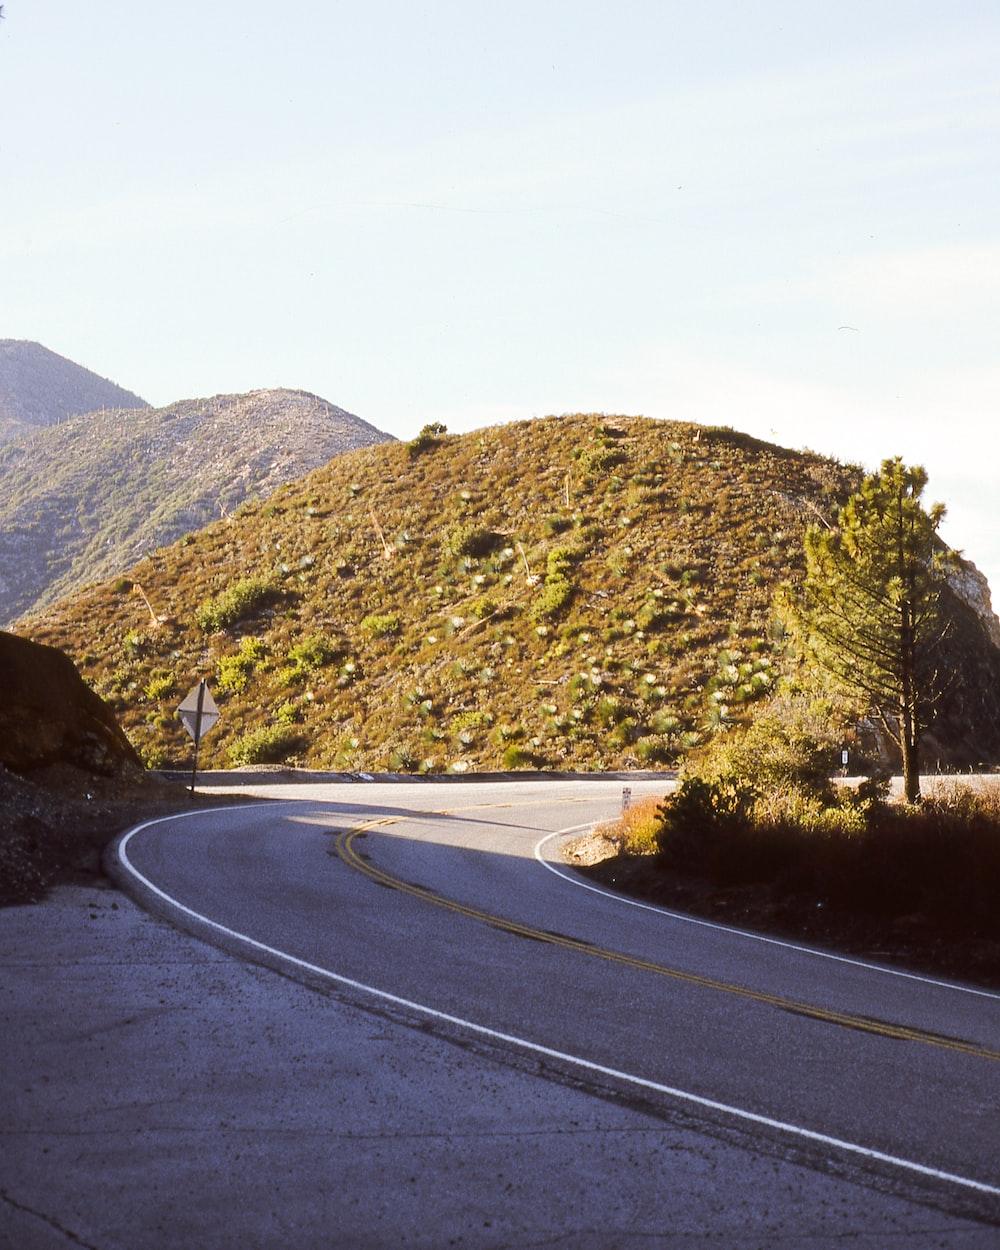 curving highway in fayetteville, arkansas